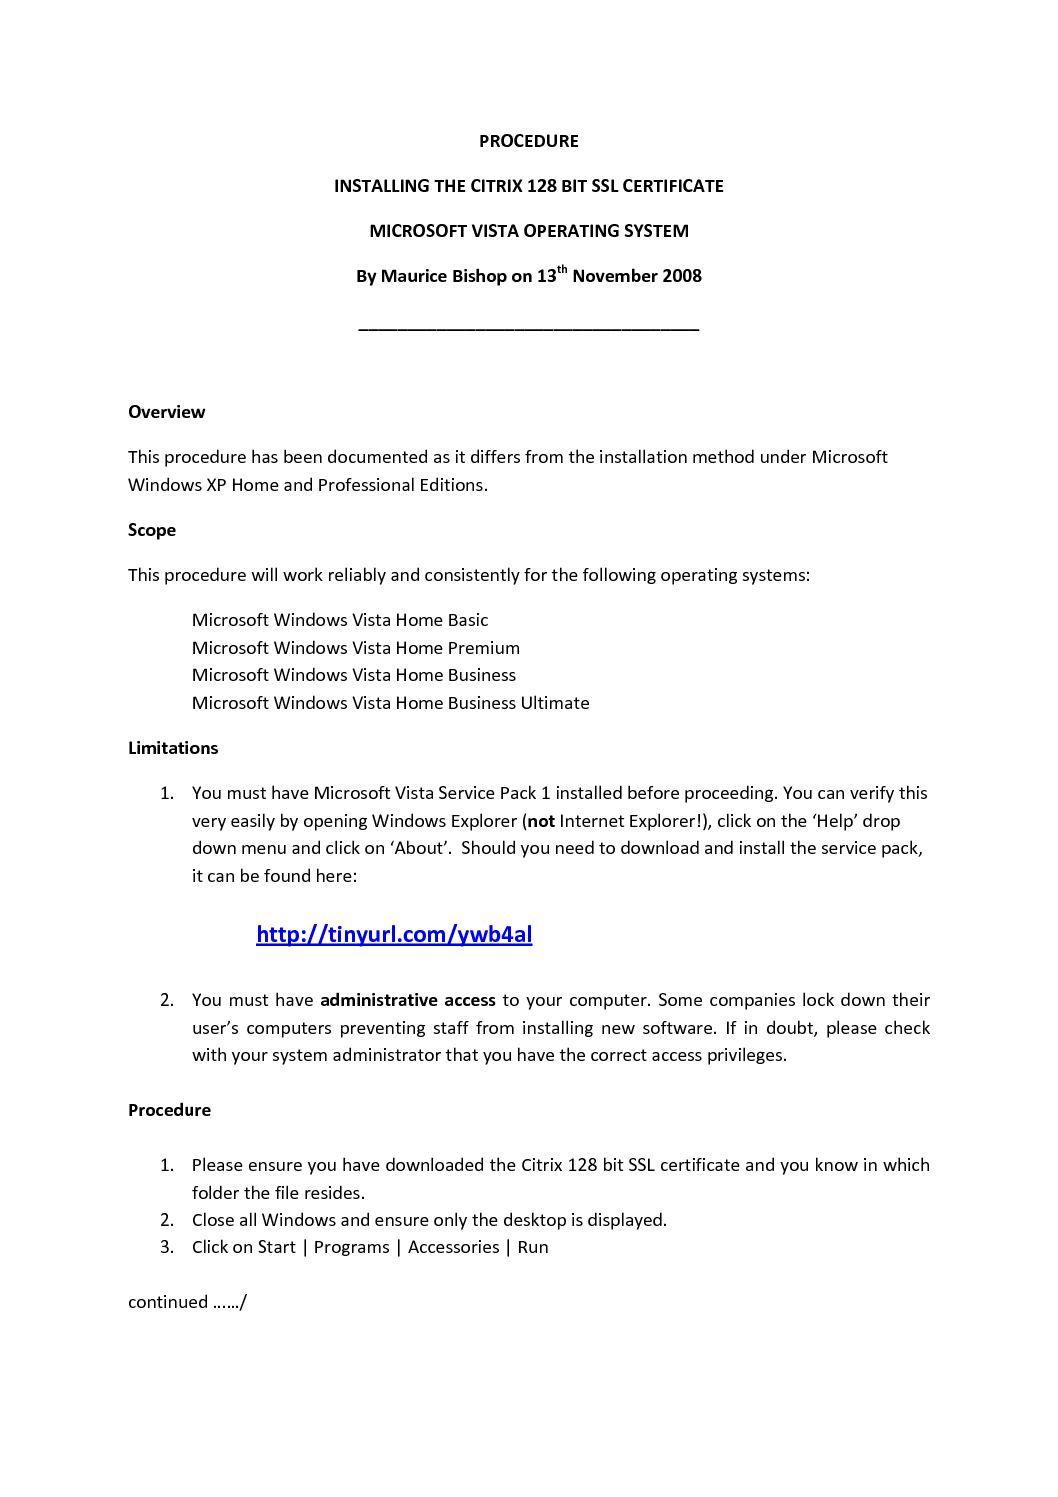 Calamo Installing Citrix 128 Bit Ssl Certificate Under Vista